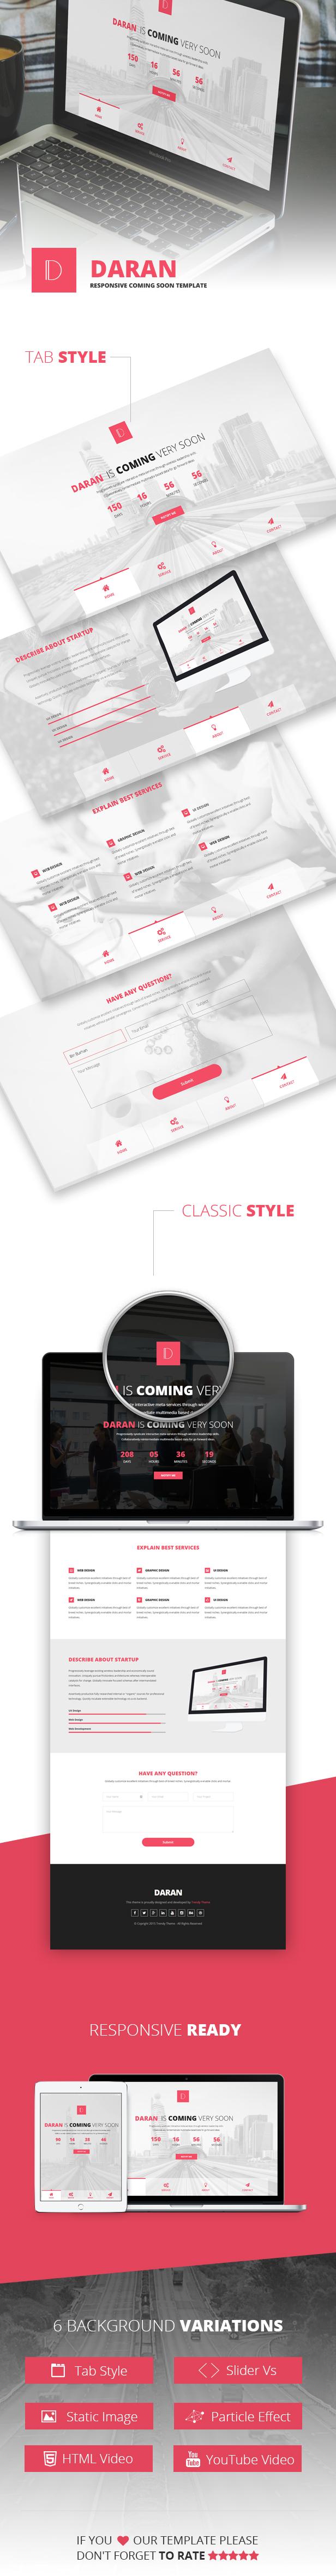 Daran Coming Soon HTML Template